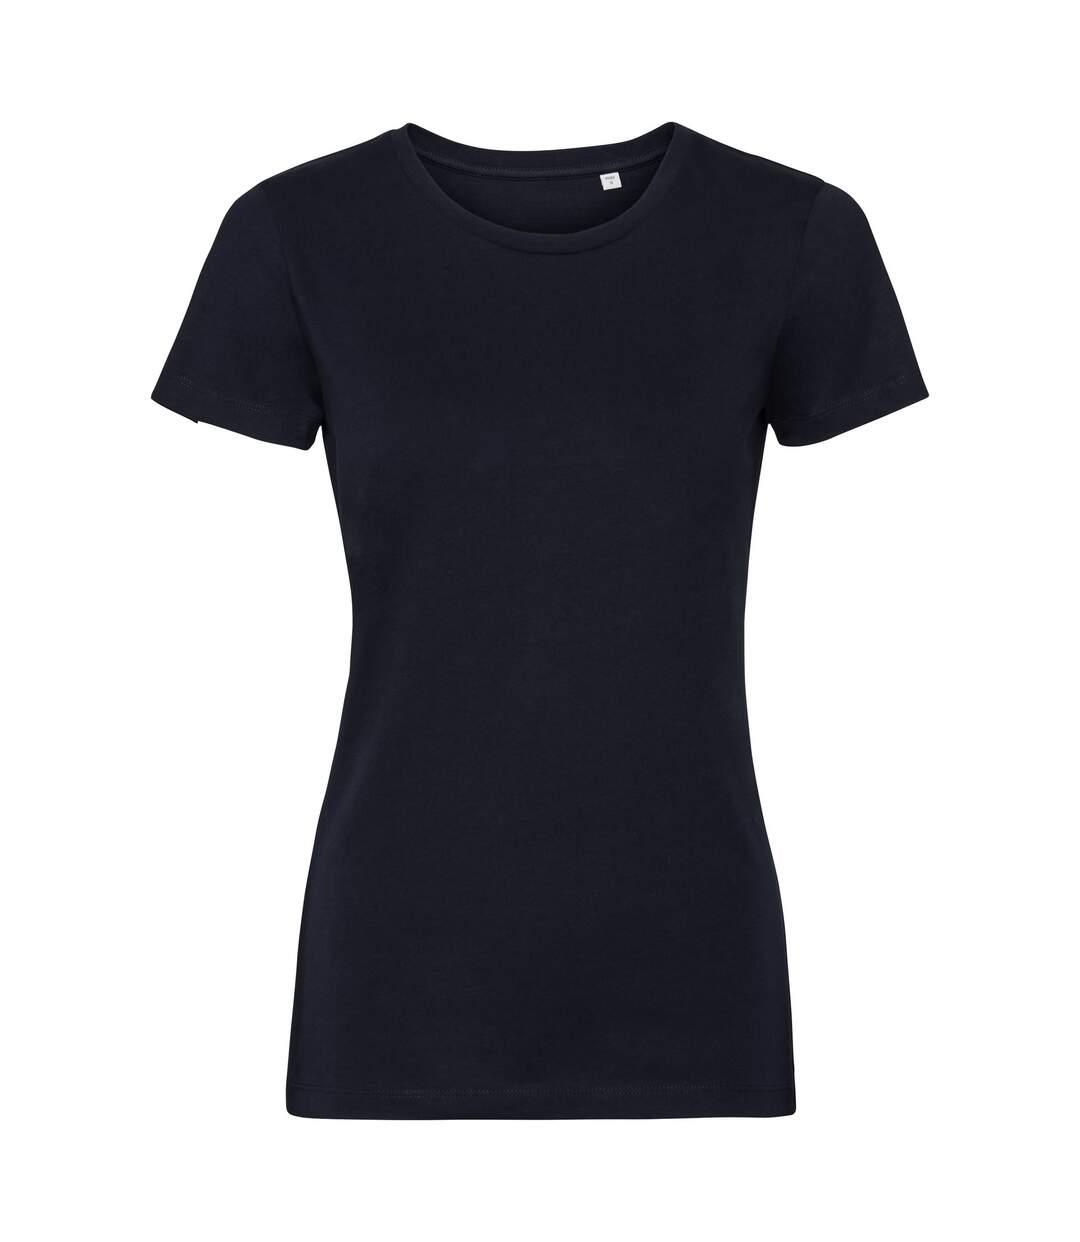 Russell - T-Shirt Bio Authentic - Femme (Blanc) - UTRW6661